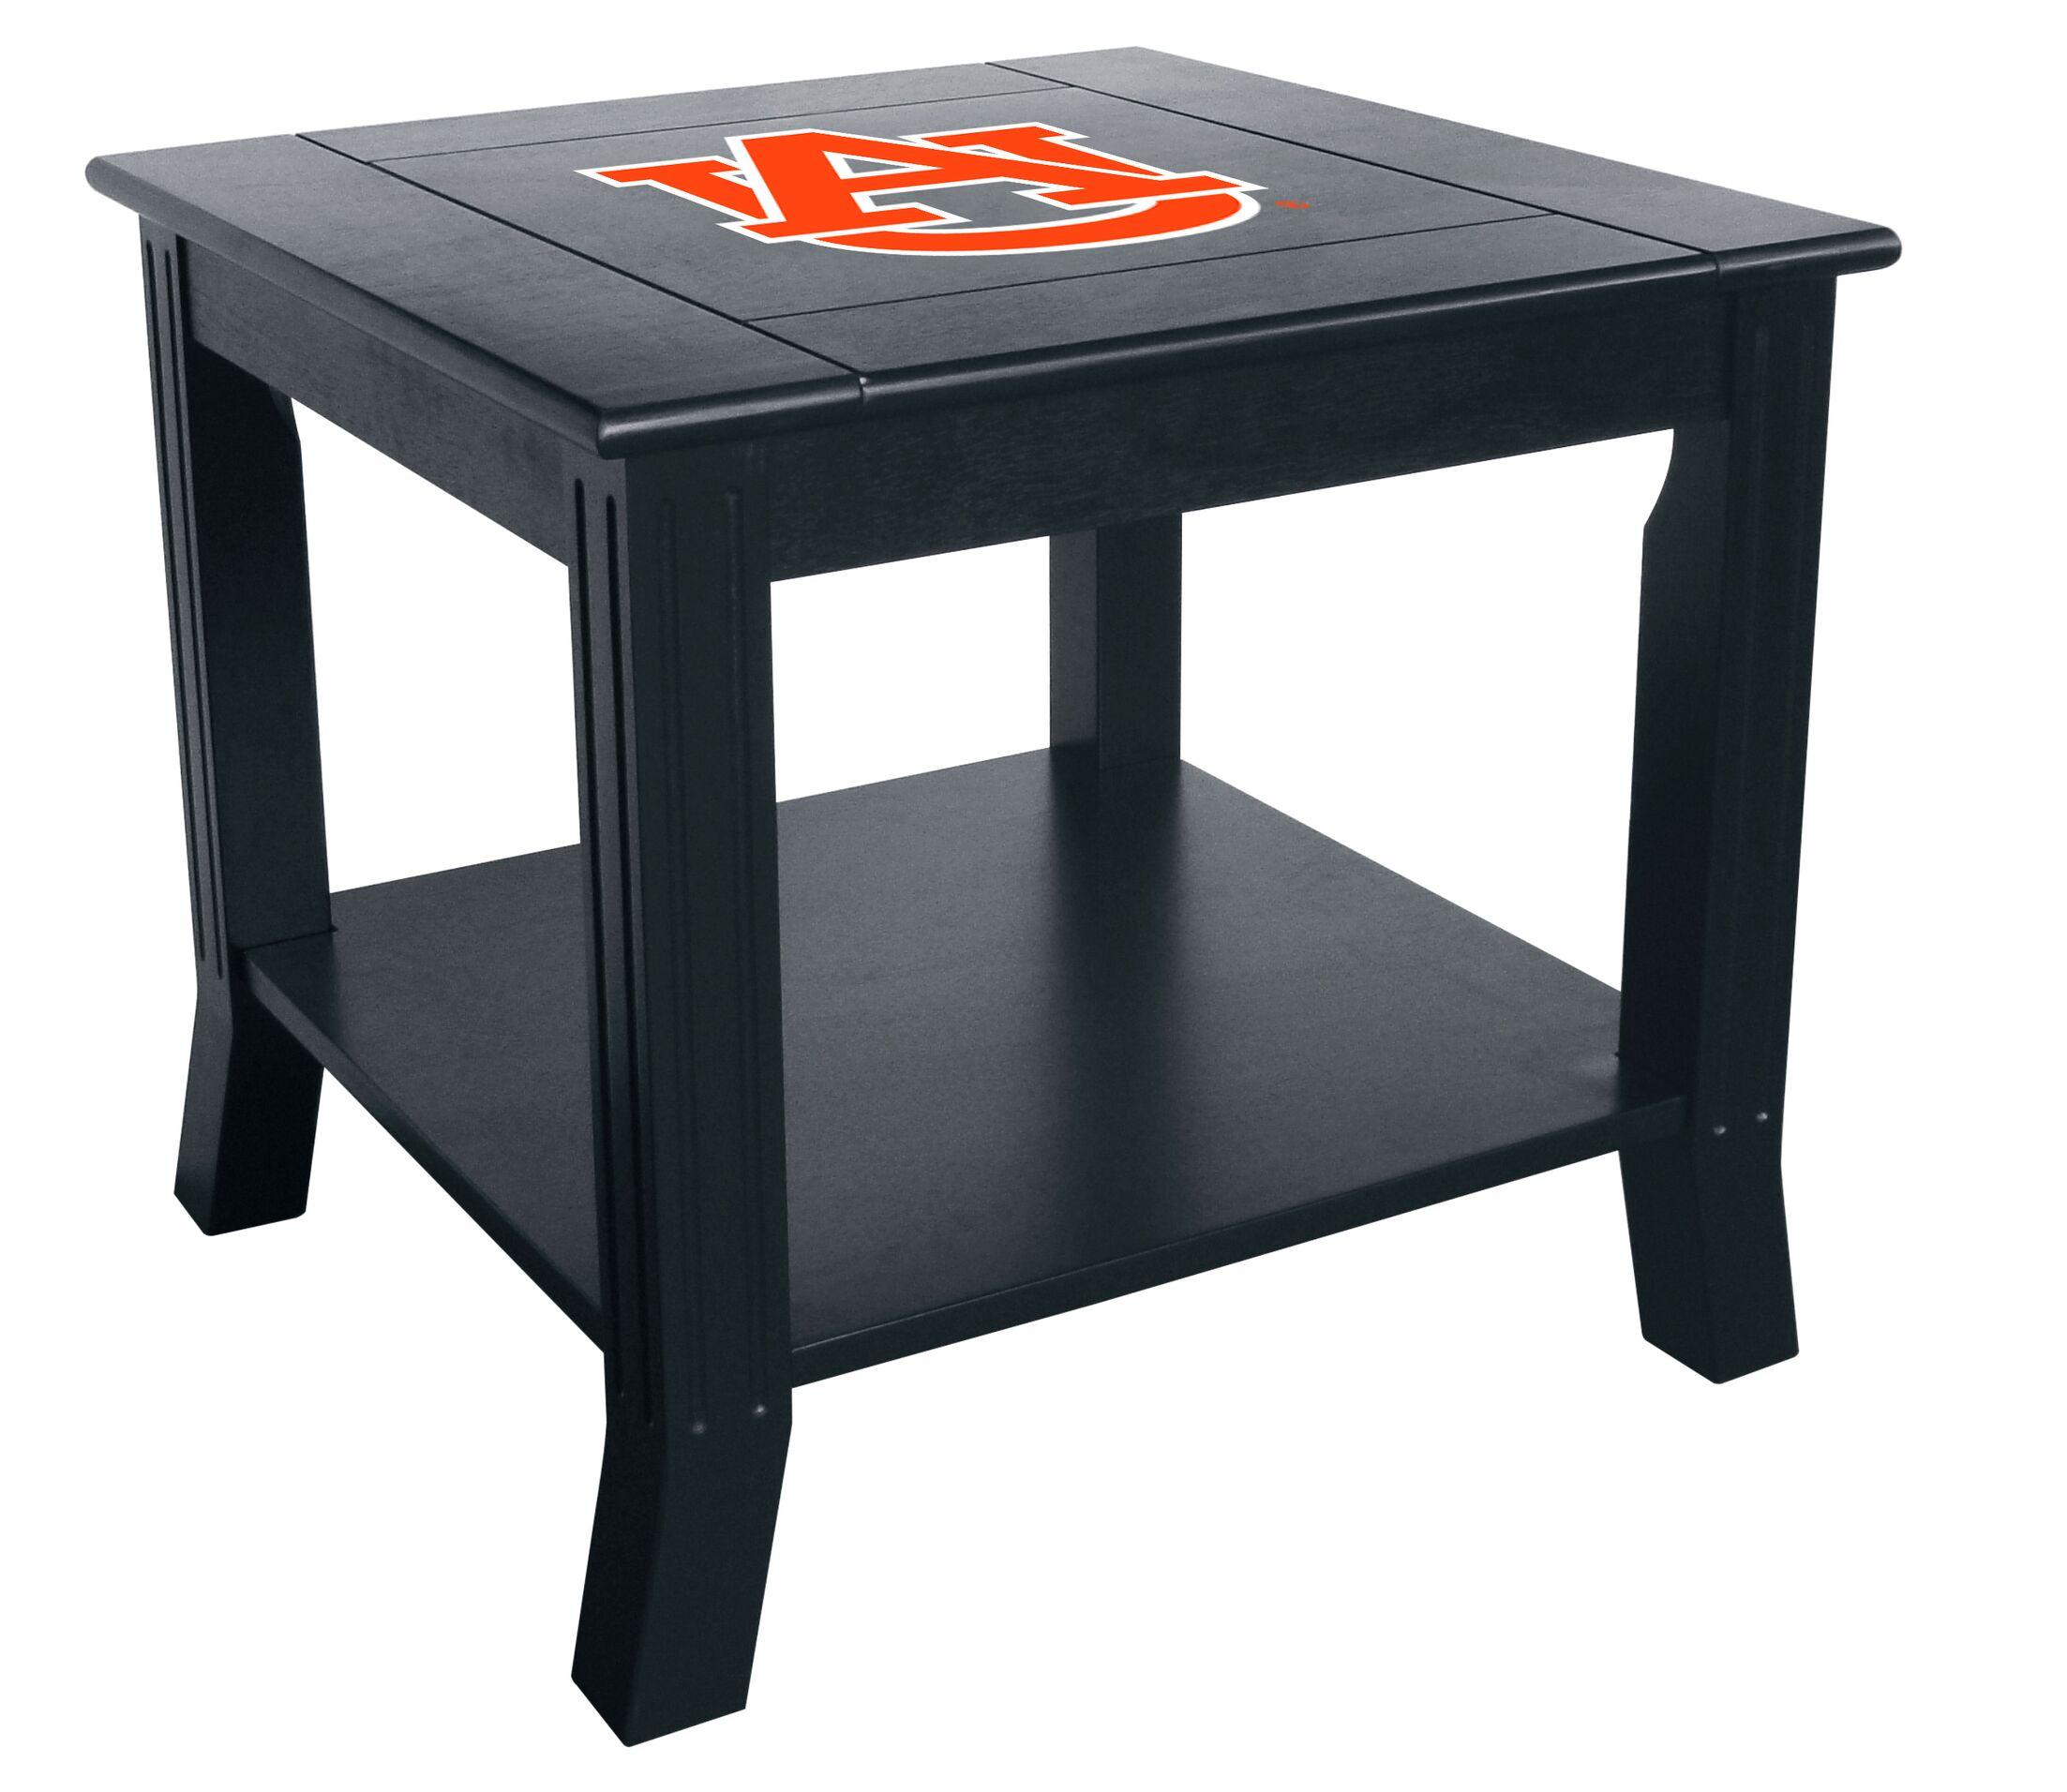 NCAA End Table NCAA Team: Auburn University